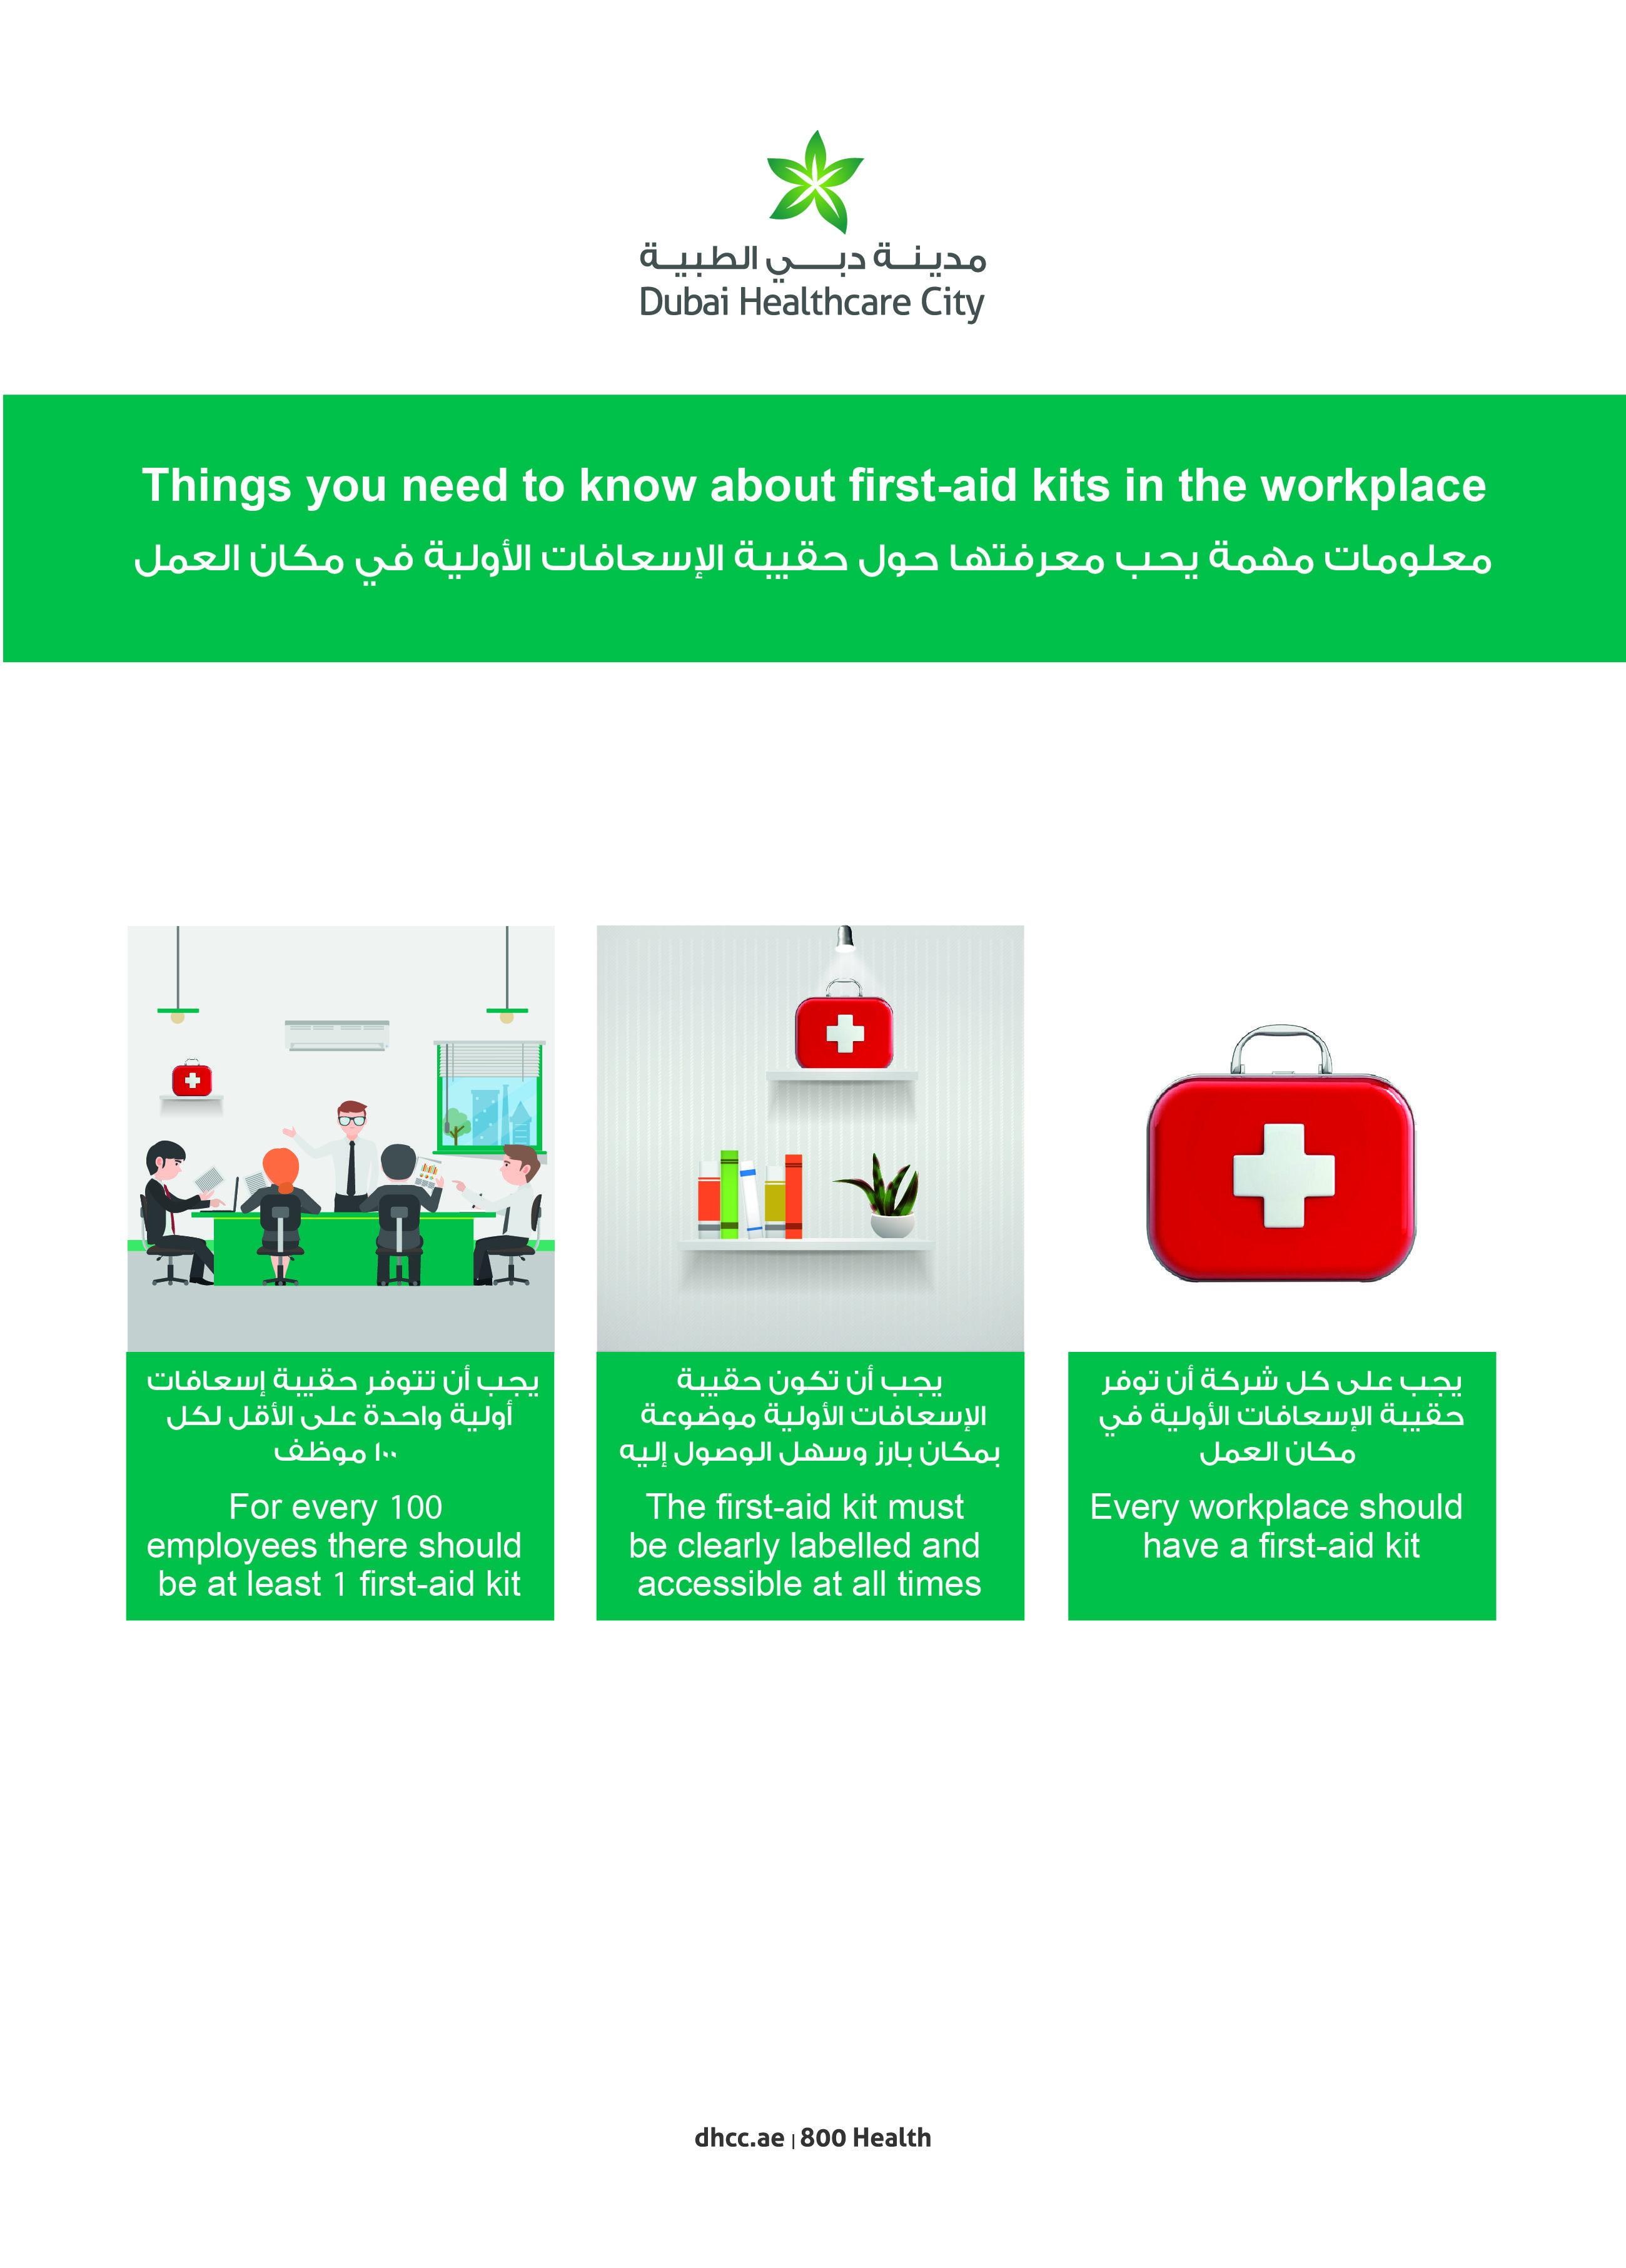 Pin By Haya On Dubai Health Care1 Health Care Dubai First Aid Kit